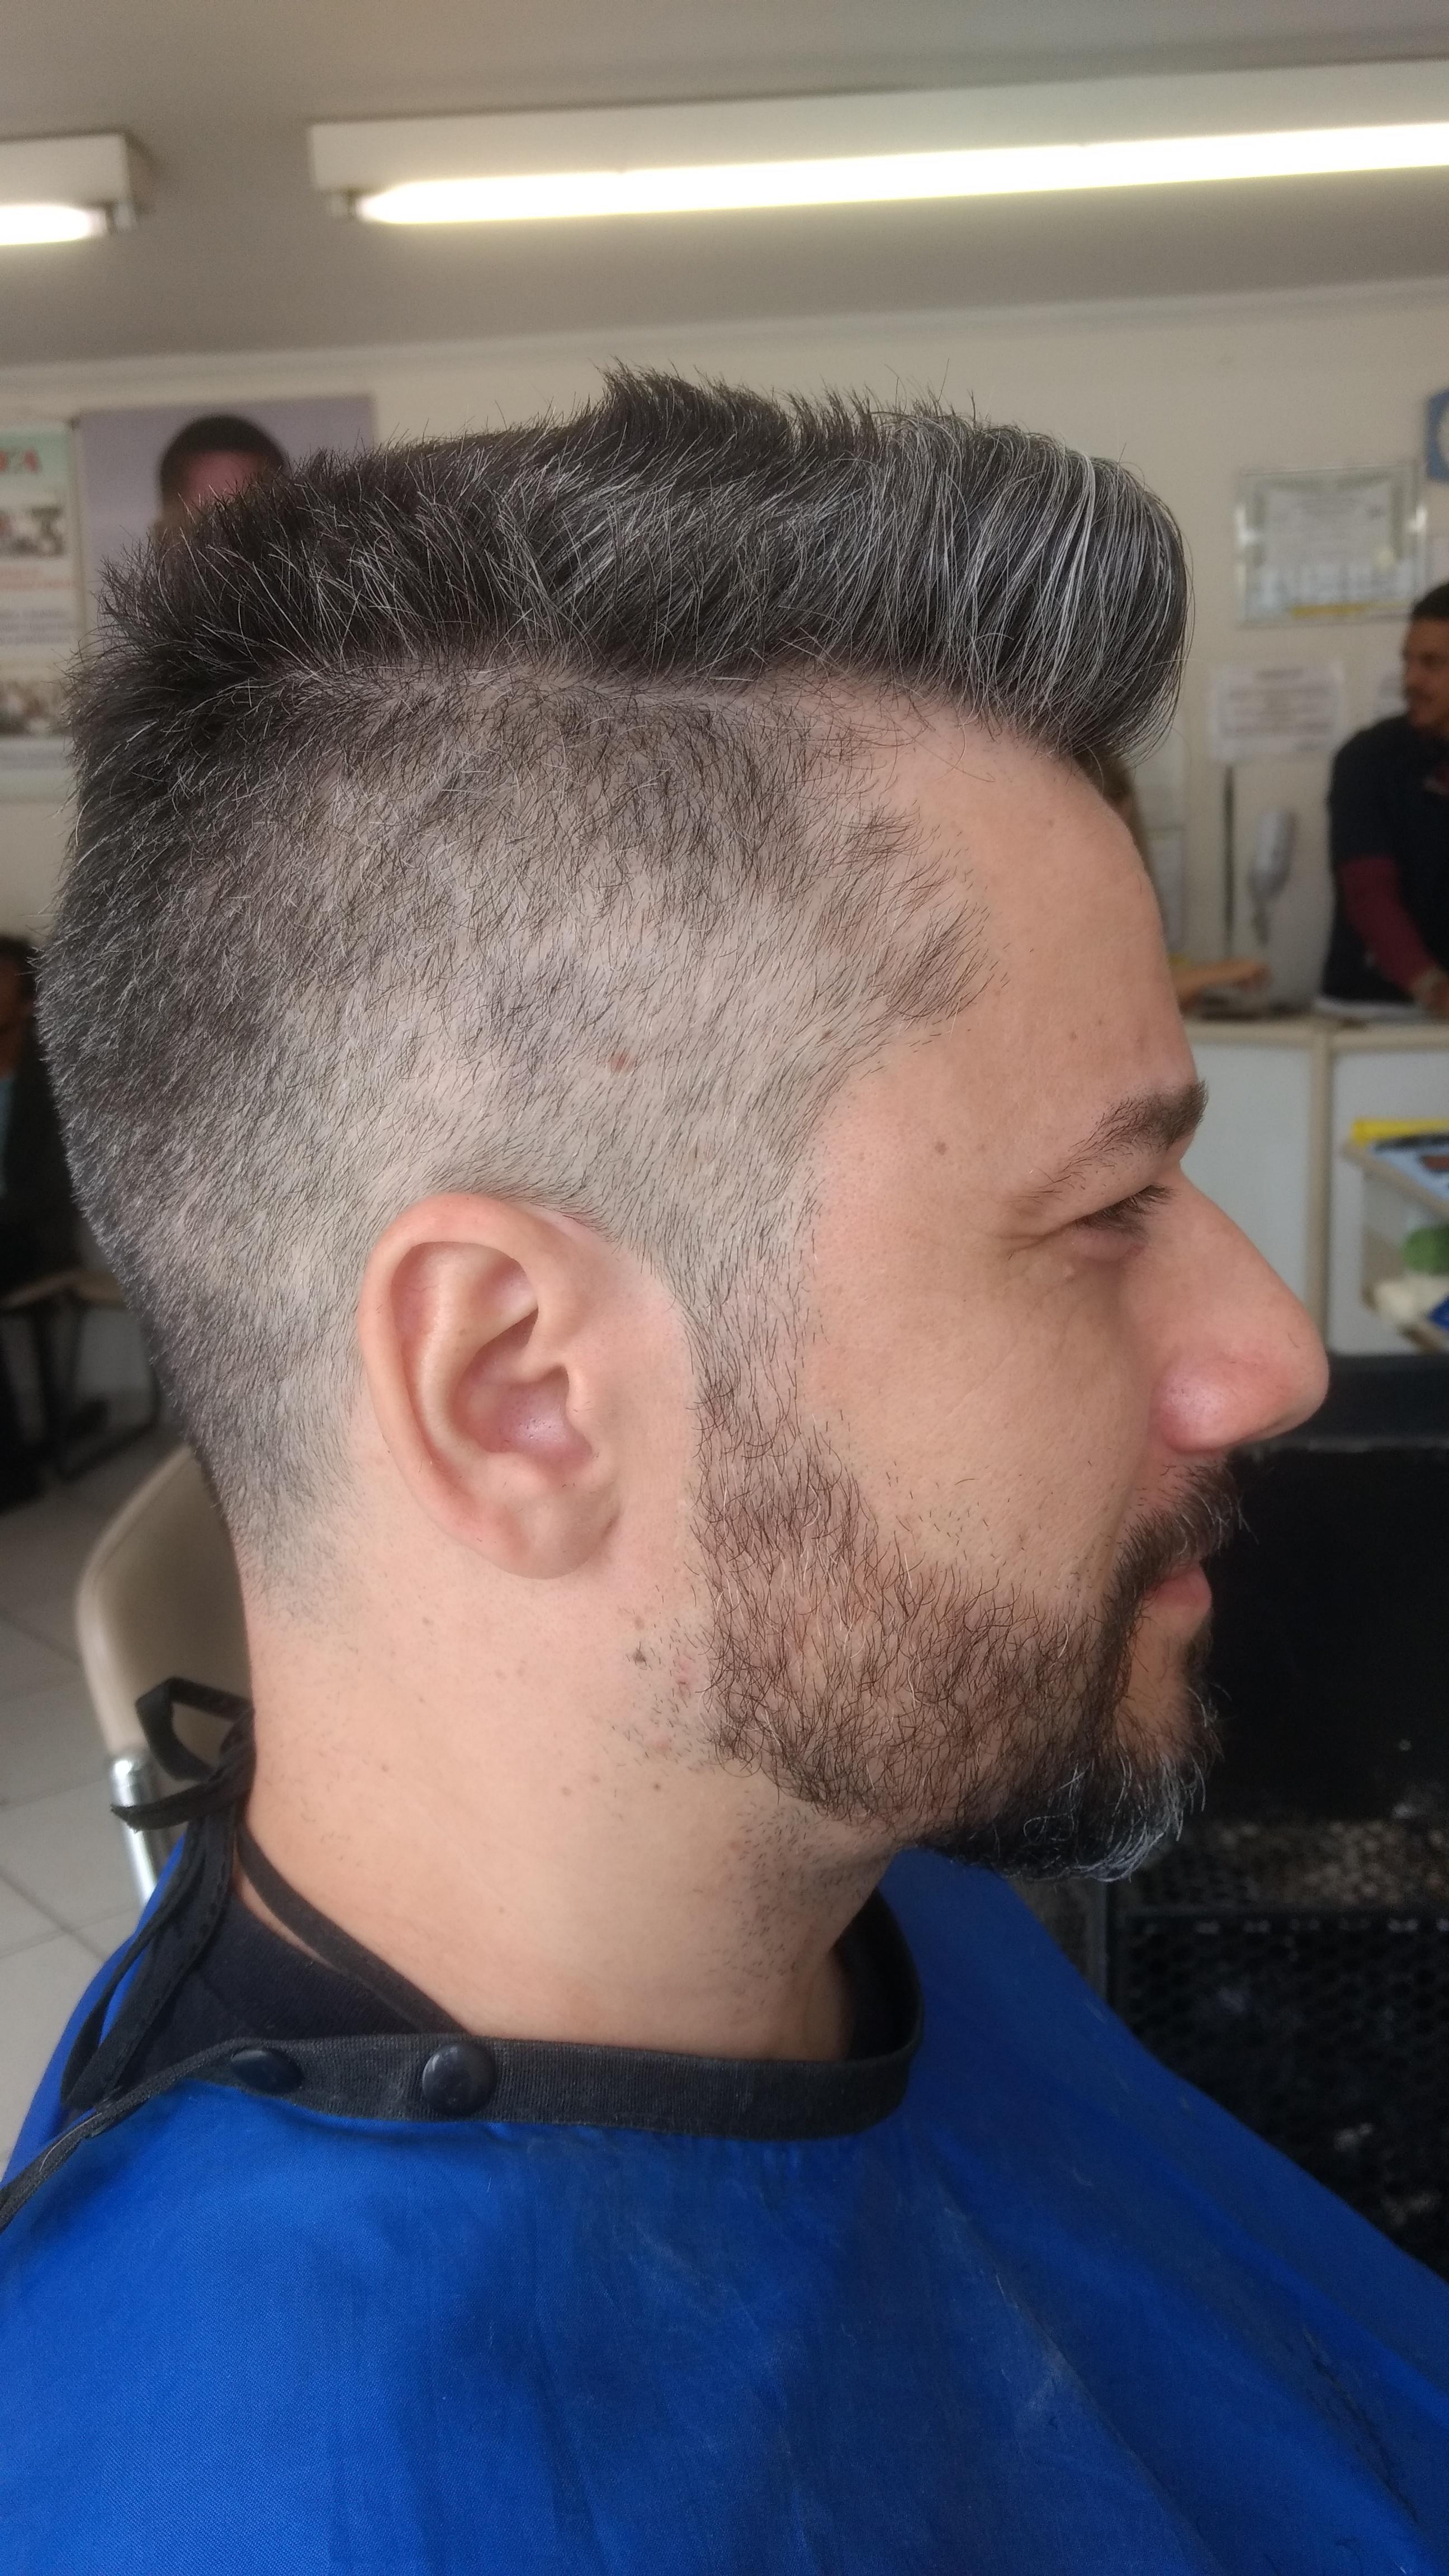 Pompoador E Fade cabelo barbeiro(a)